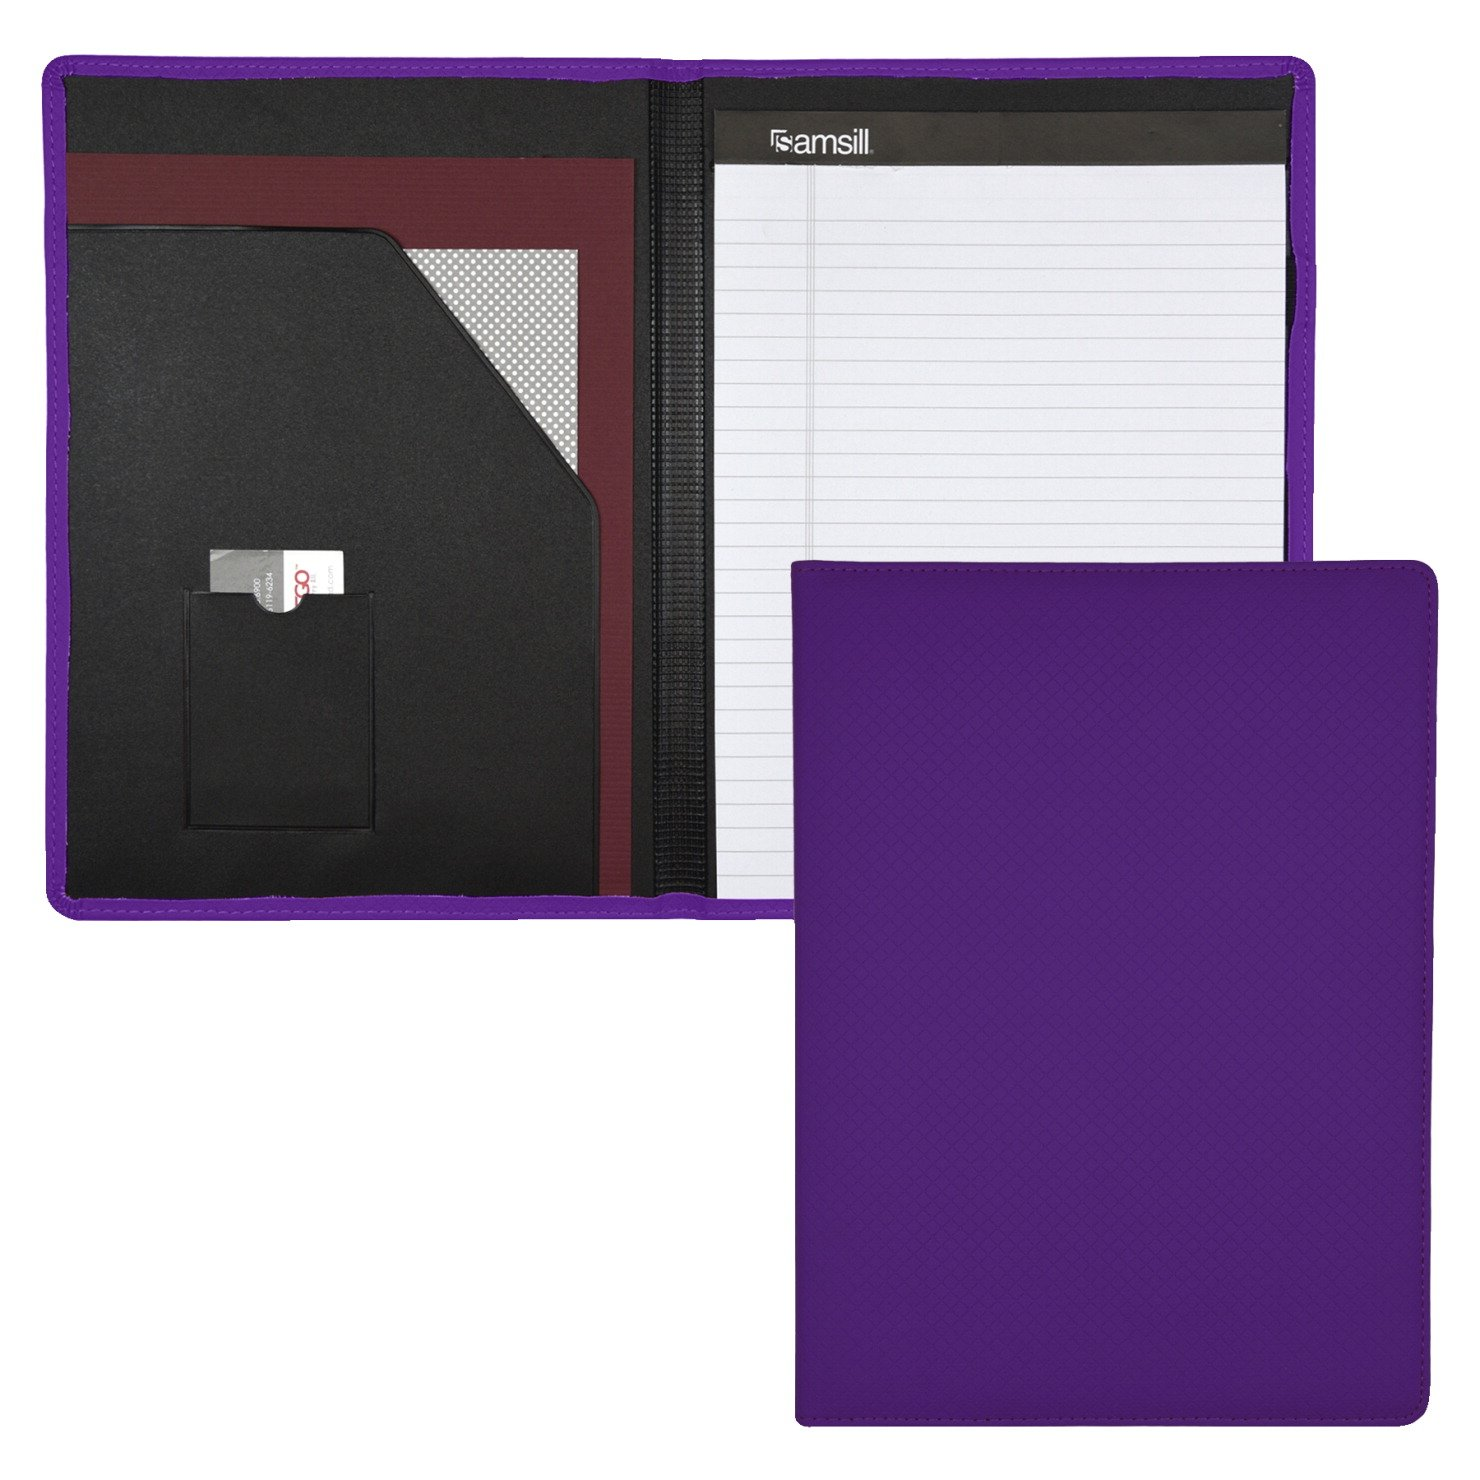 Samsill Fashion Padfolio / Portfolio for Women, Diamond Deboss Design, 8.5 x 11 Writing Pad, Purple